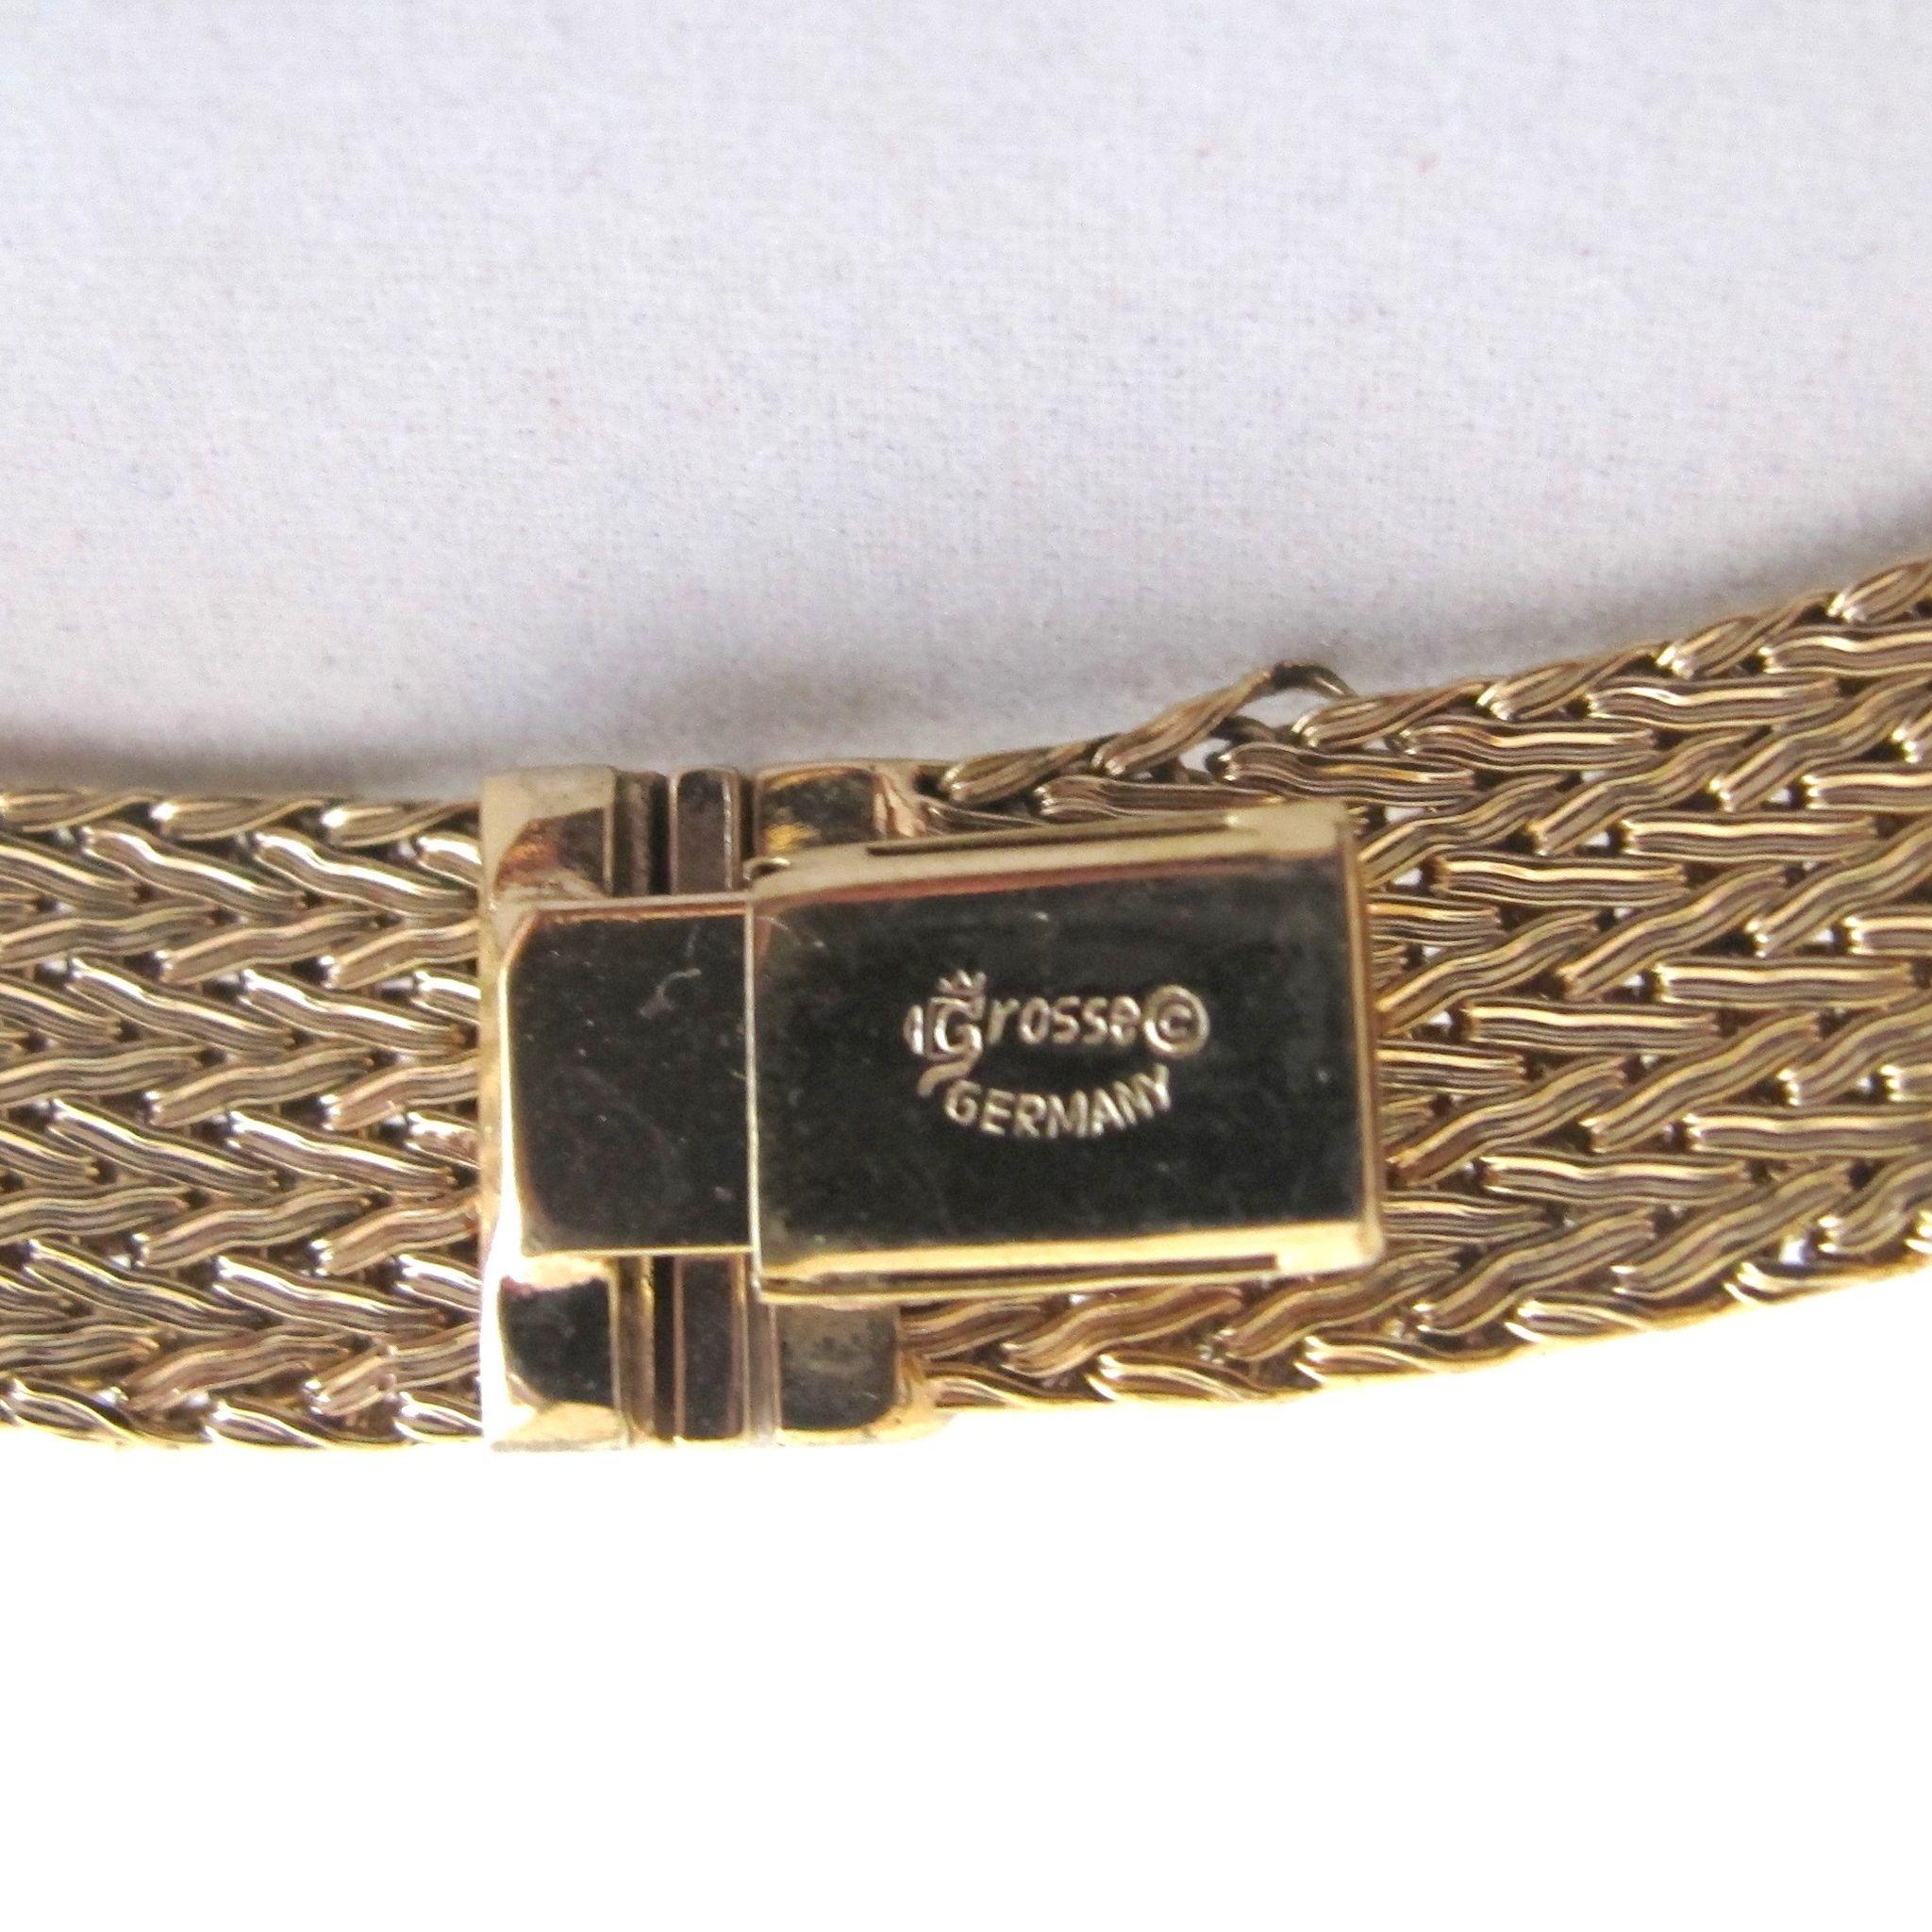 vintage grosse germany gold tone choker necklace from 2heartsjewelry rl on ruby lane. Black Bedroom Furniture Sets. Home Design Ideas